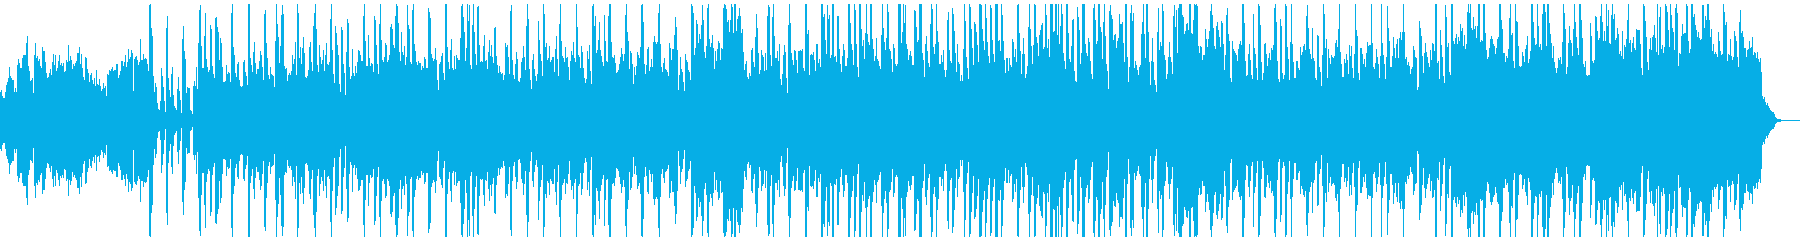 Frankfurter Waltzの再生済みの波形